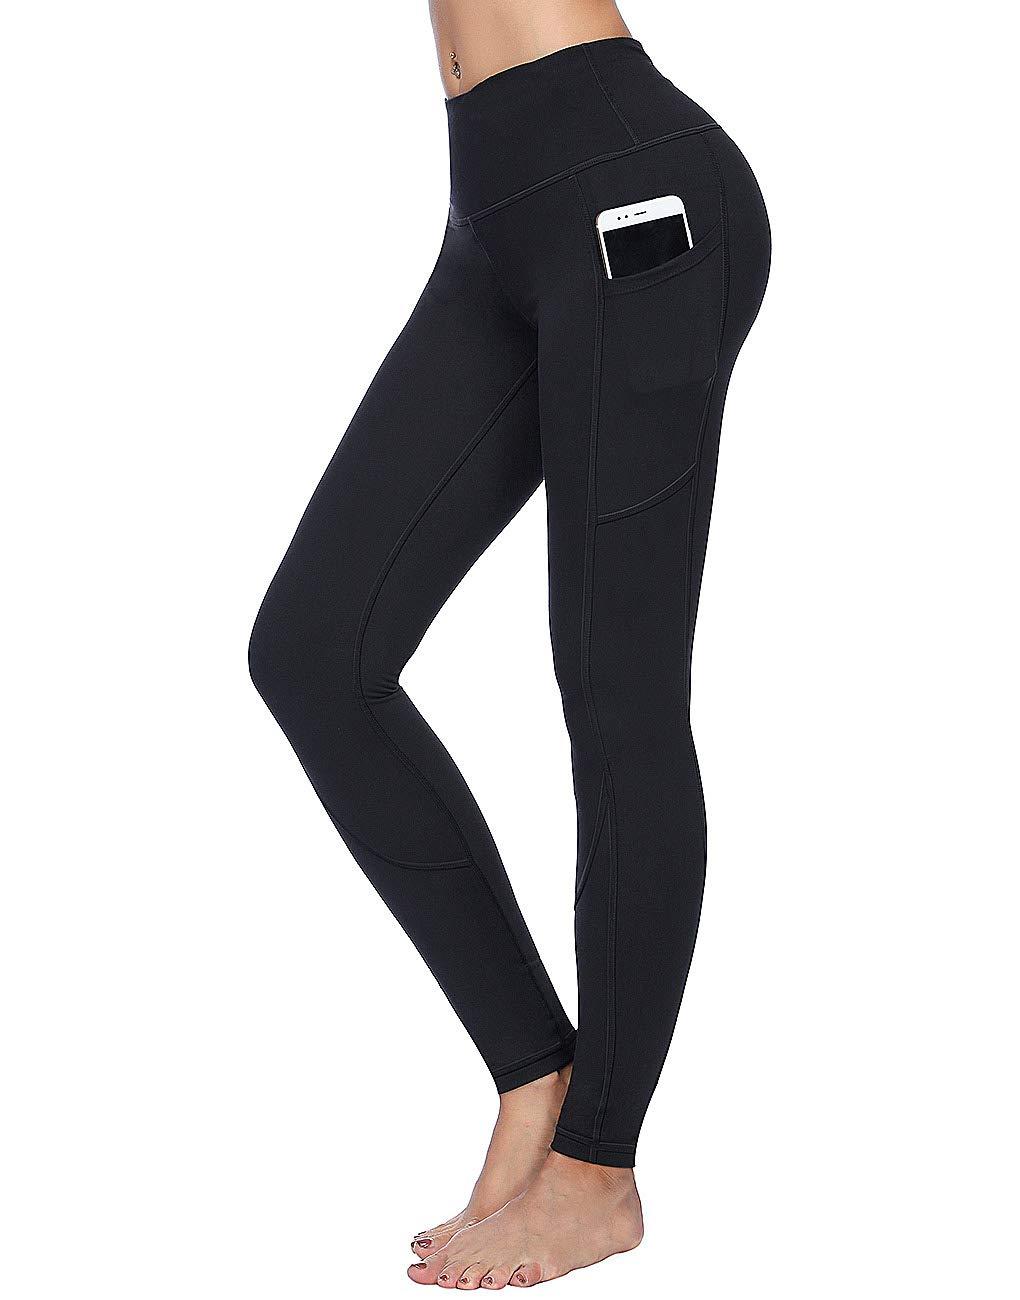 HOFI-High-Waist-Yoga-Pants-for-Women-Side-Inner-Pockets-with-Tummy-Control-Sports-Leggings